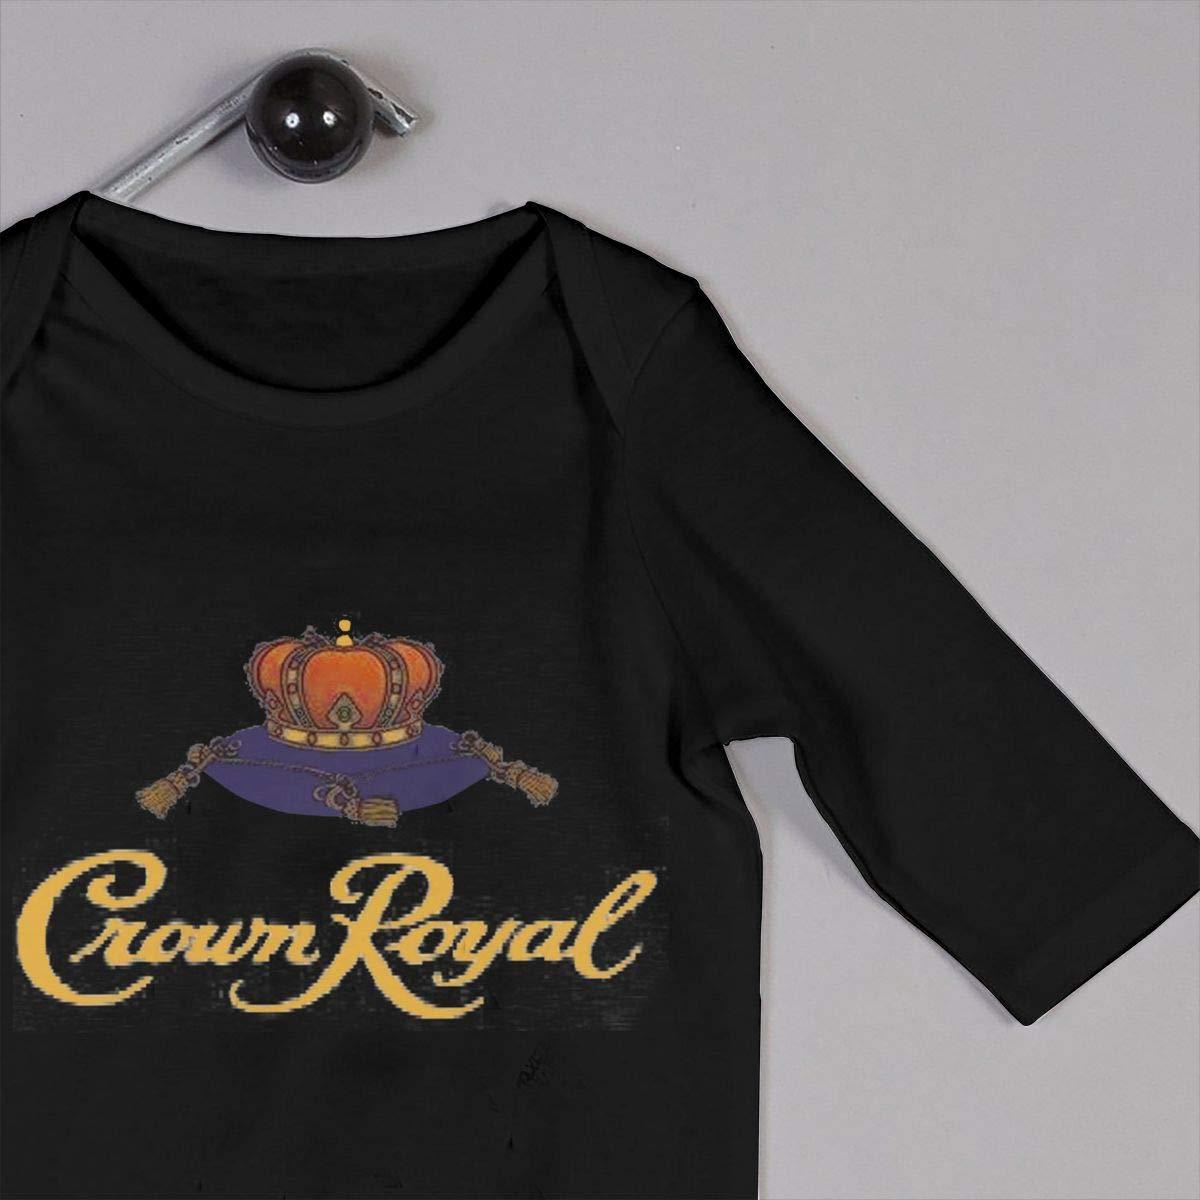 Fional Infant Long Sleeve Romper Crown Royal Newborn Babys 0-24M Organic Cotton Jumpsuit Outfit